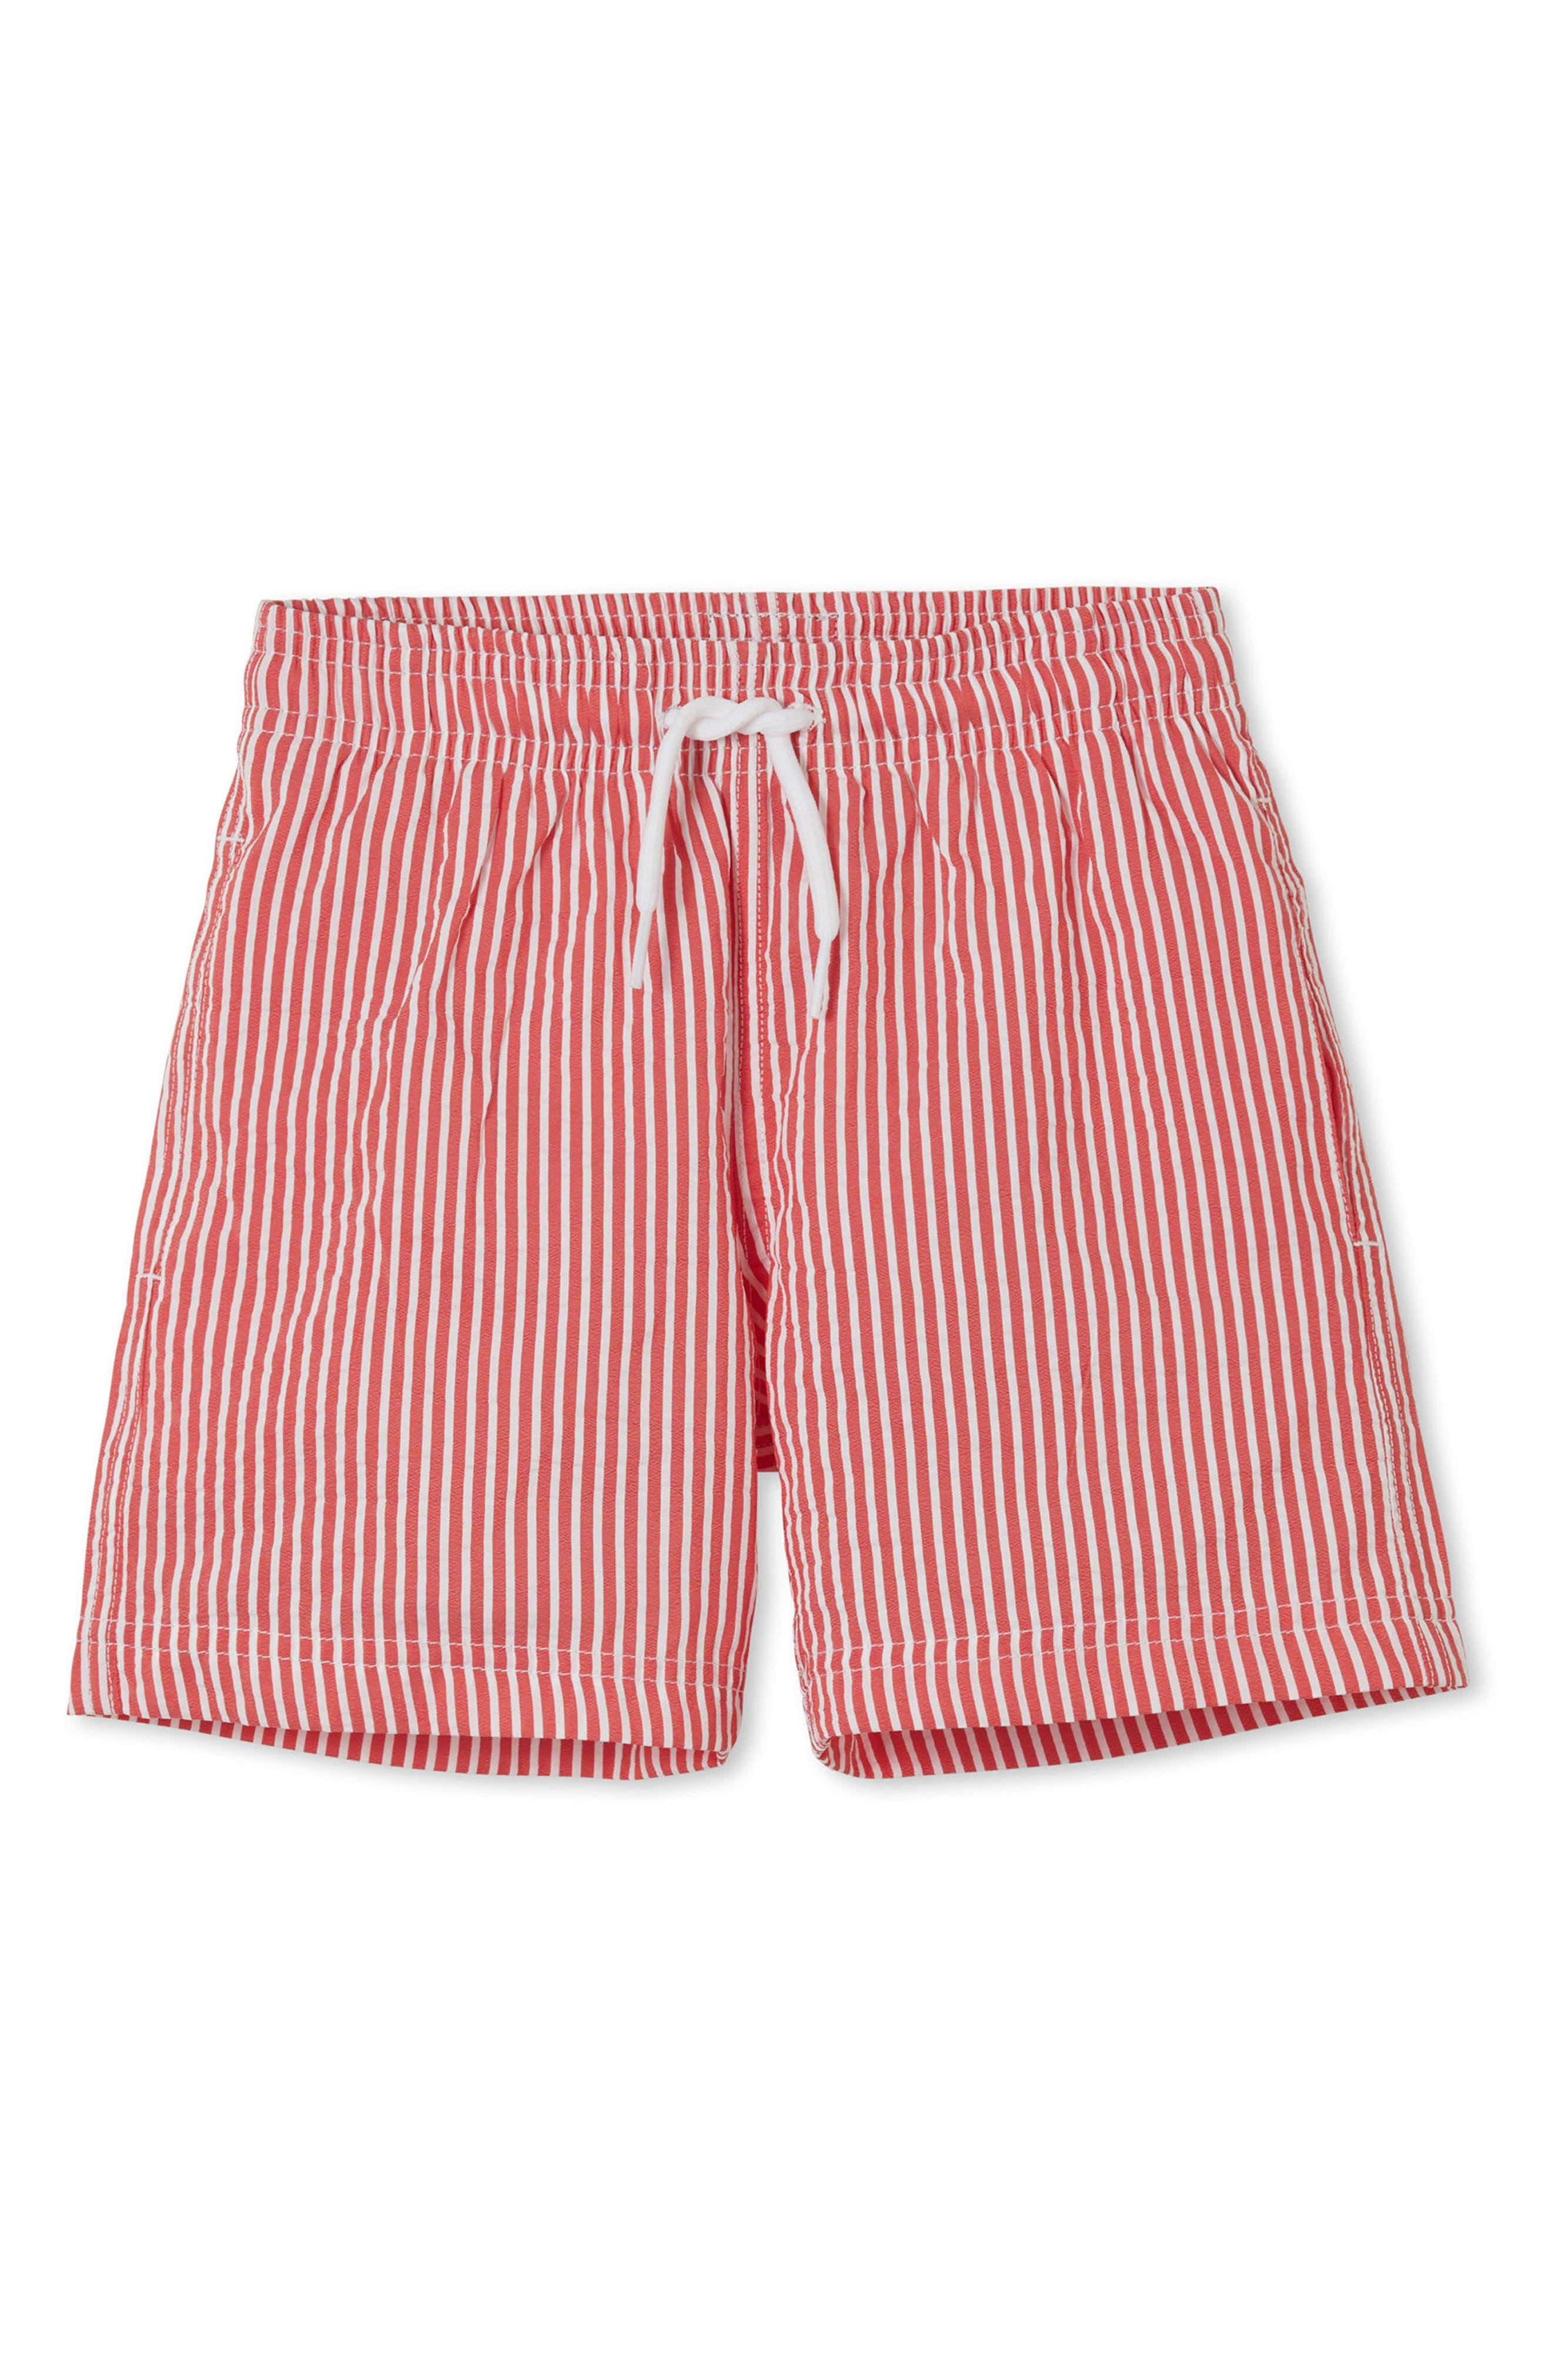 Main Image - Stella Cove Red Stripe Swim Trunks (Toddler Boys & Little Boys)